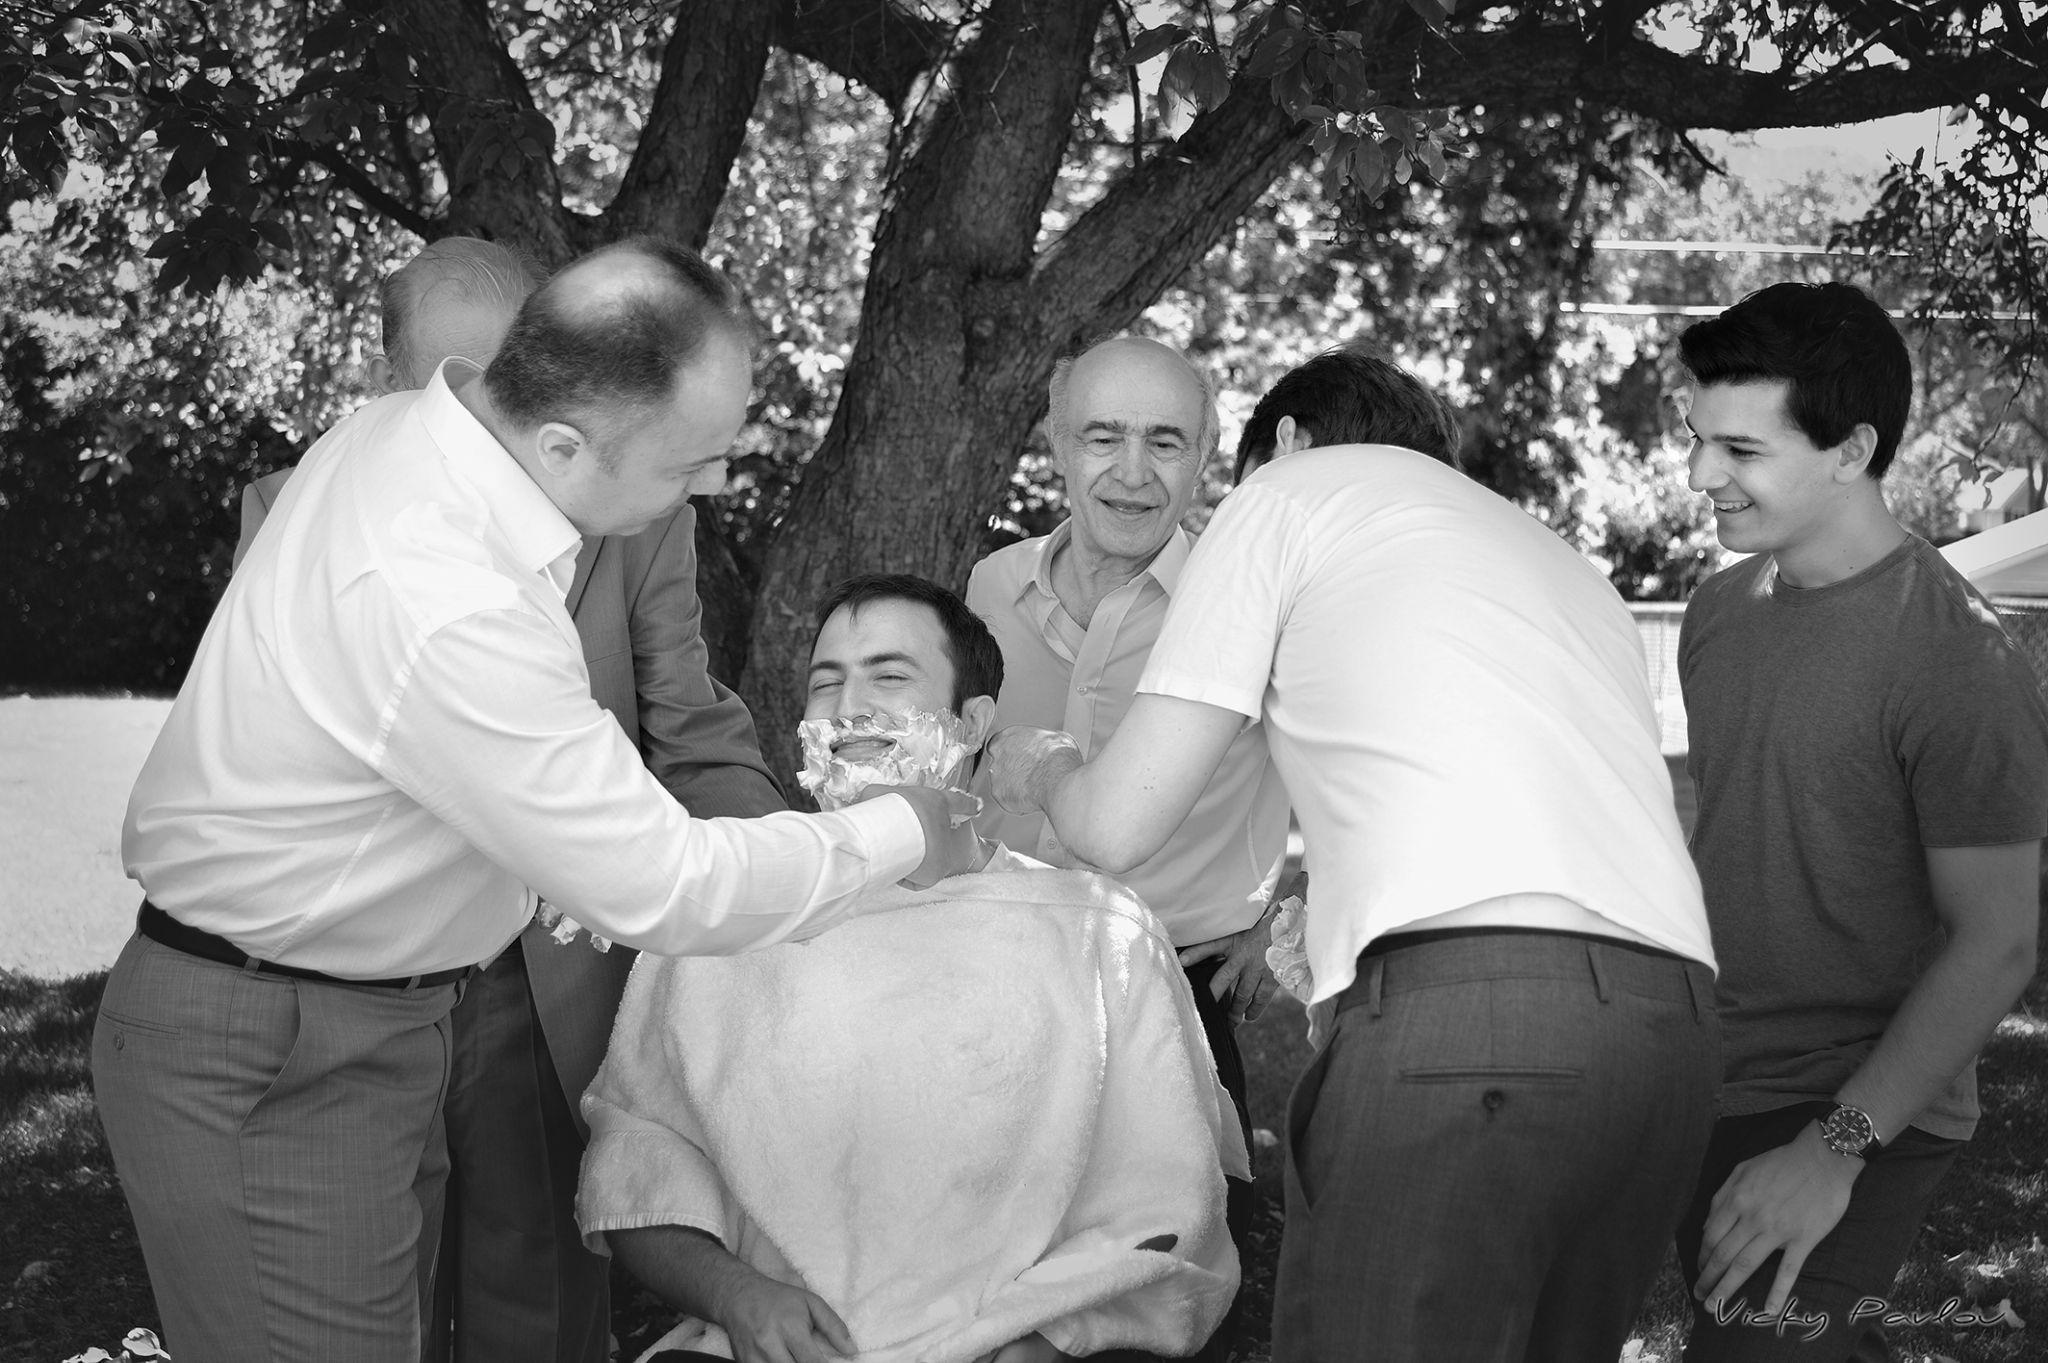 Shaving the groom by Vicky Pavlou